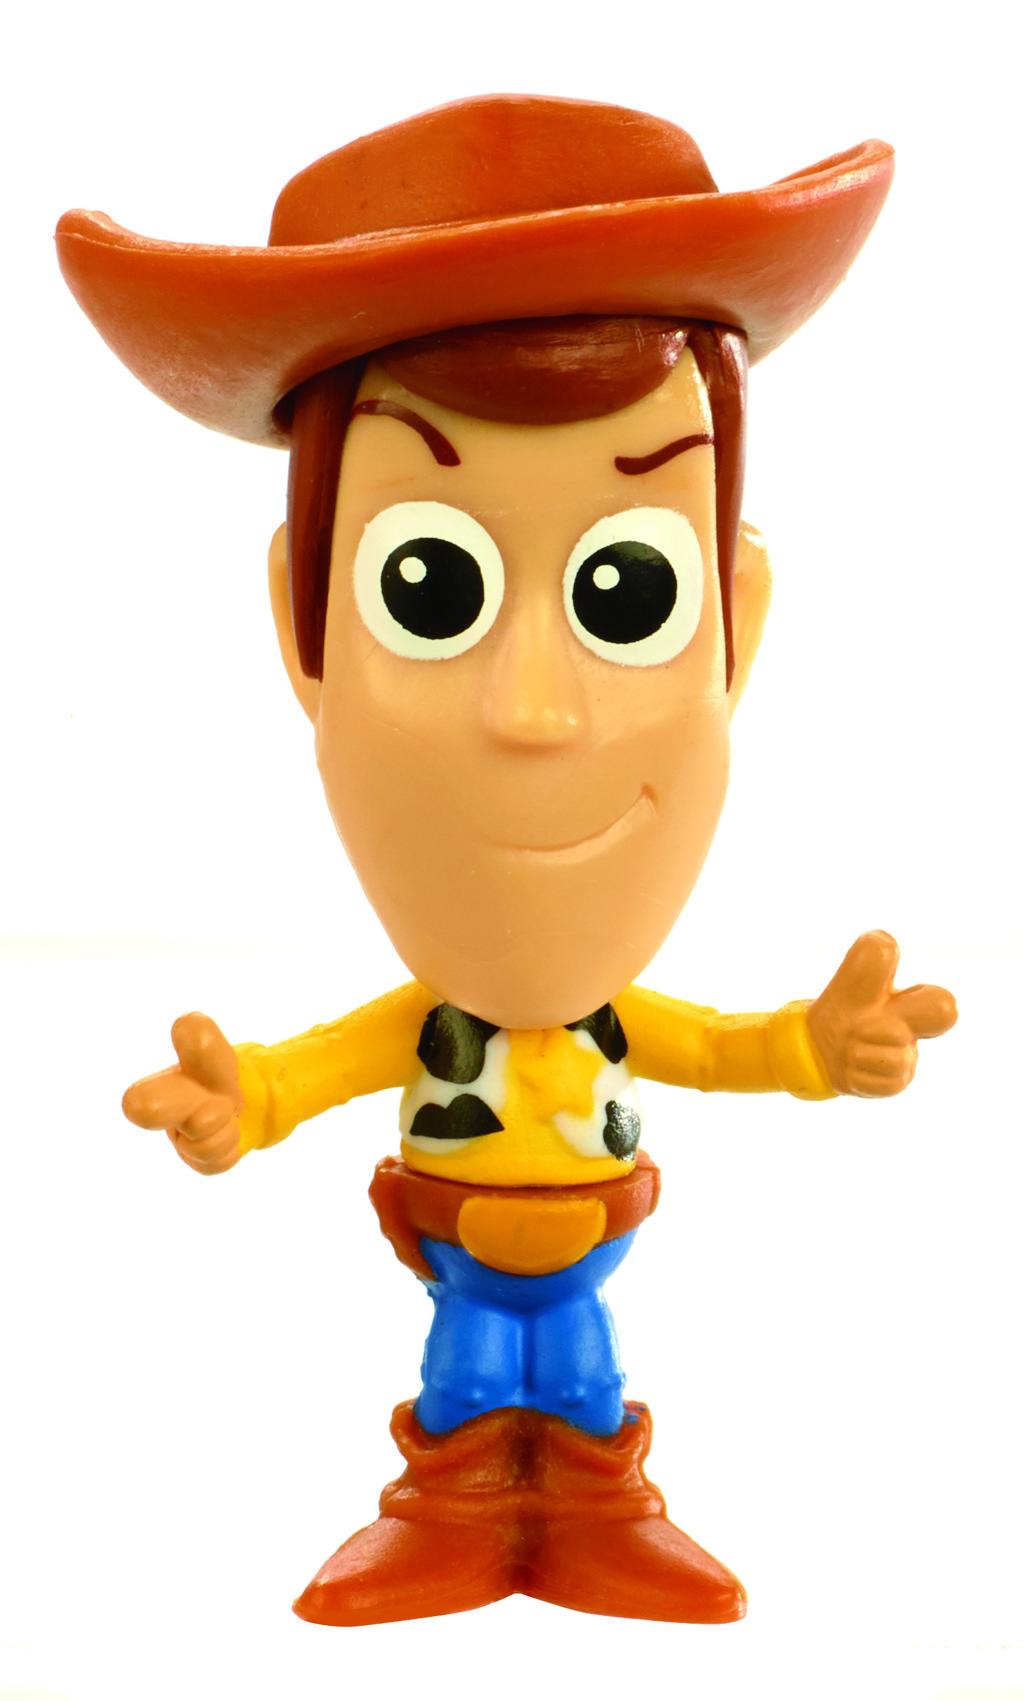 Toy story 4 minifigurka